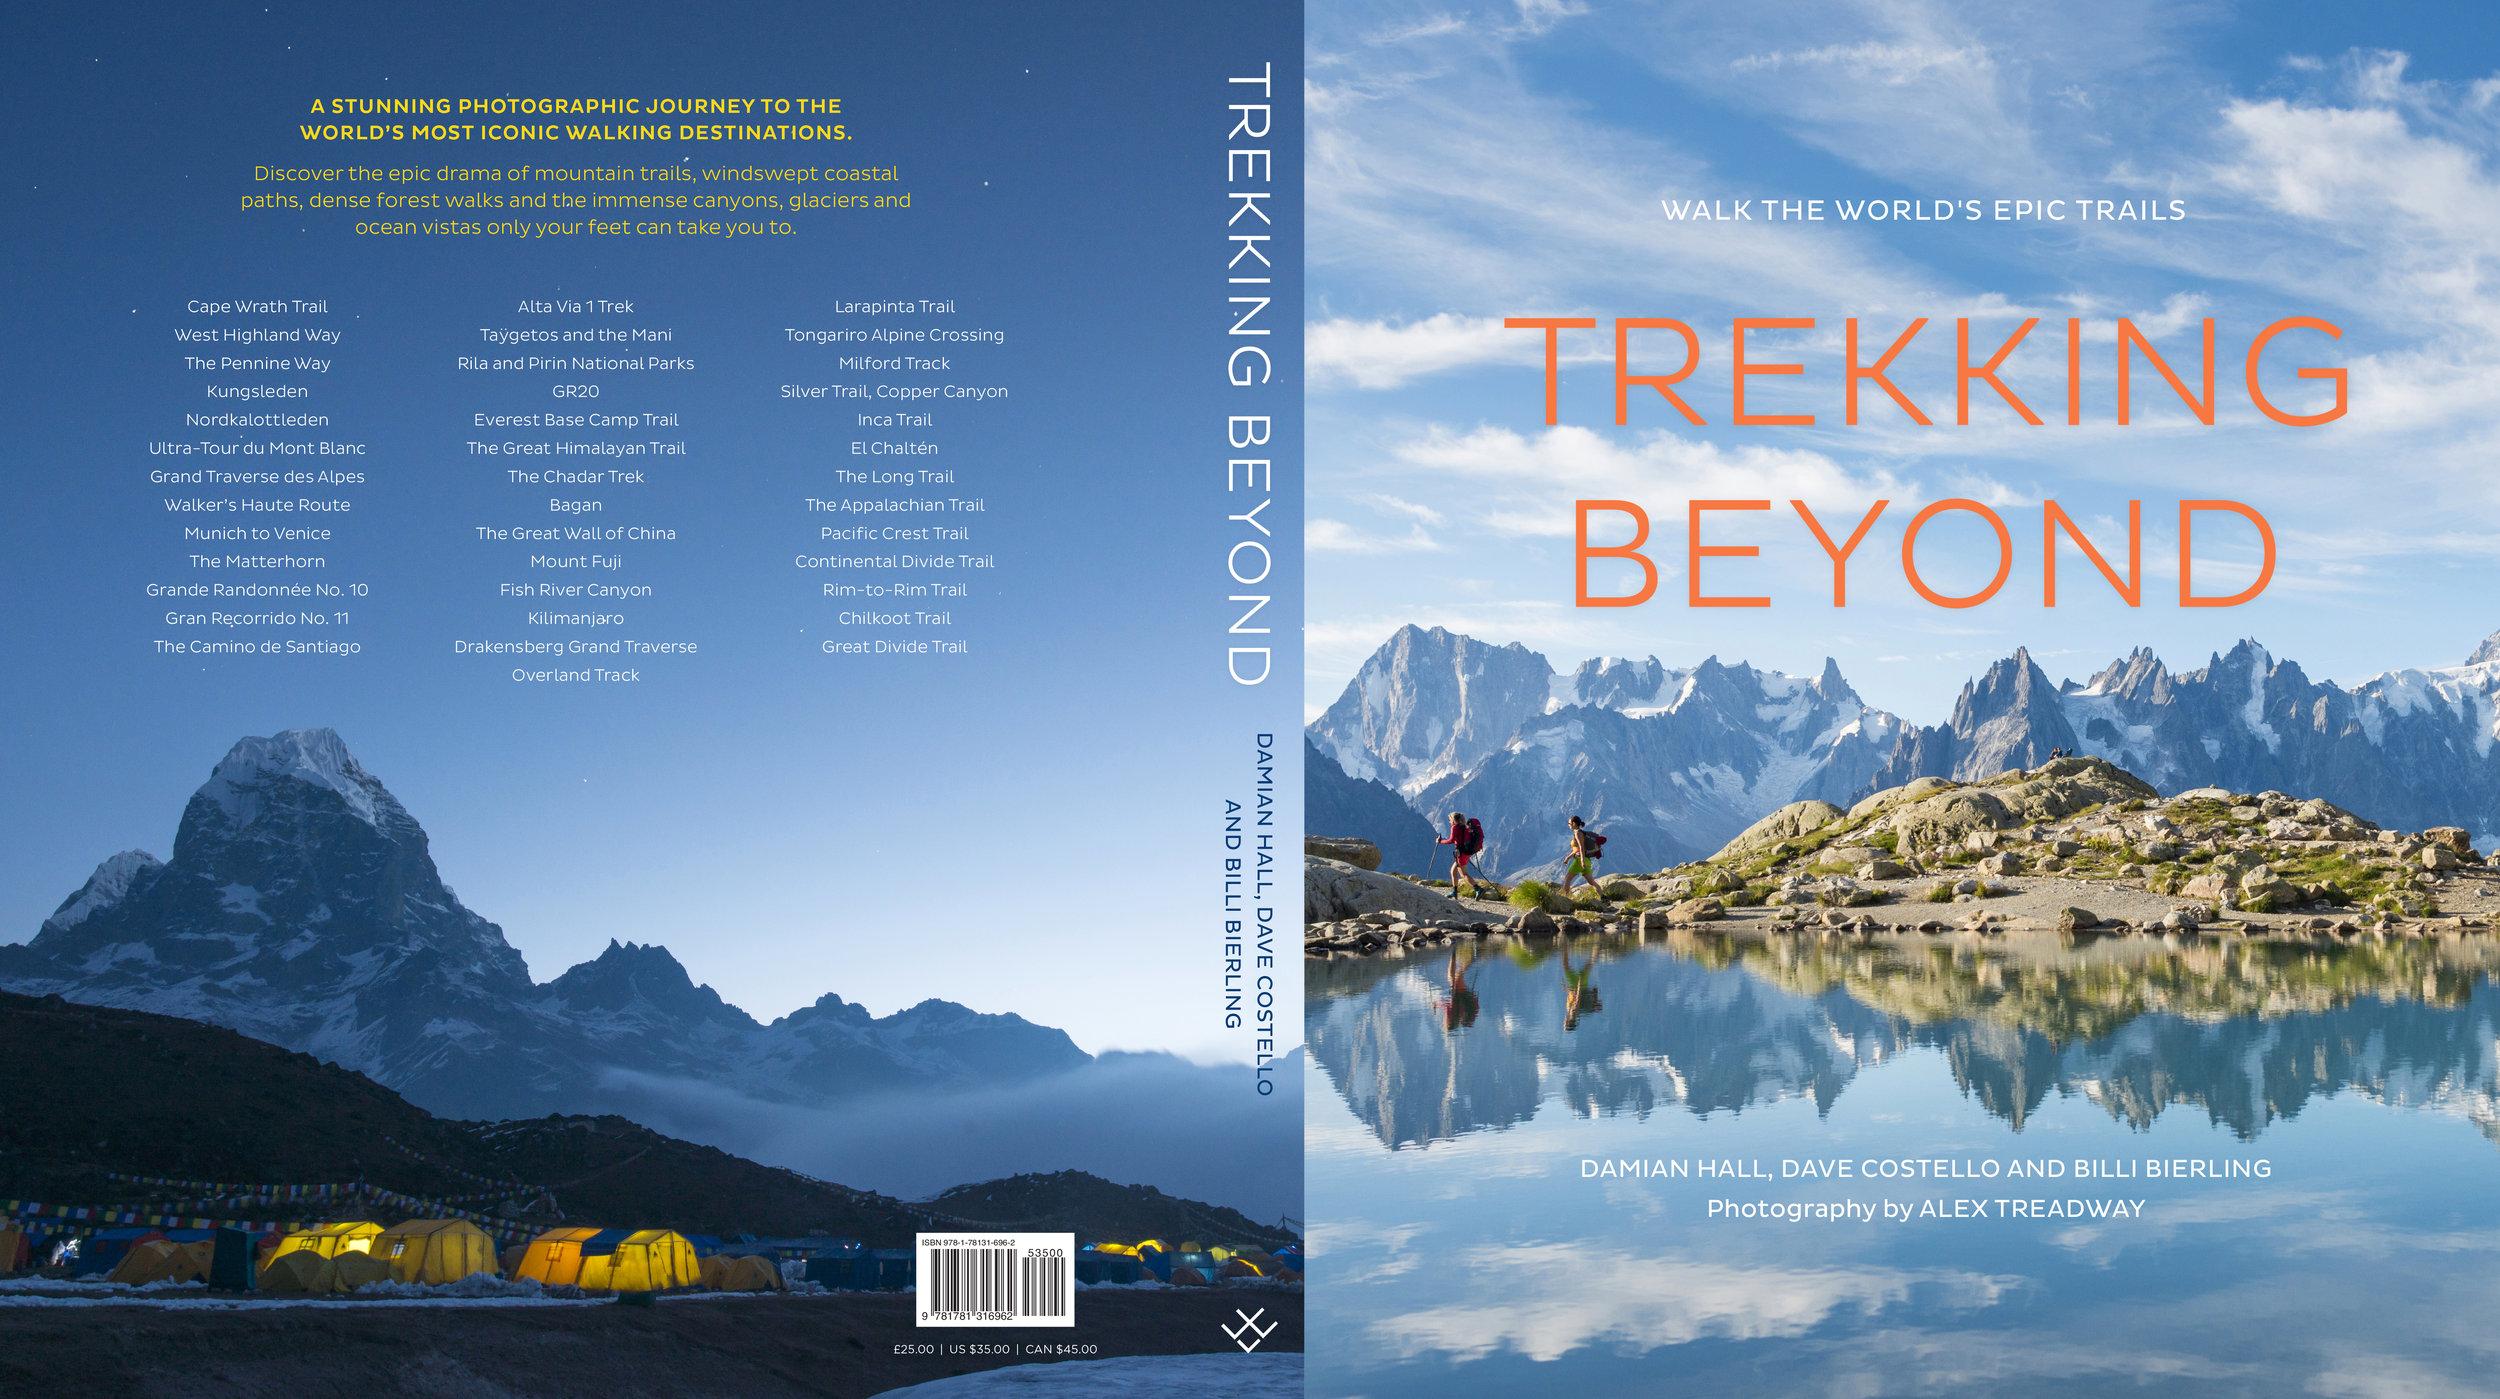 Trekking Beyond jacket-1.jpg